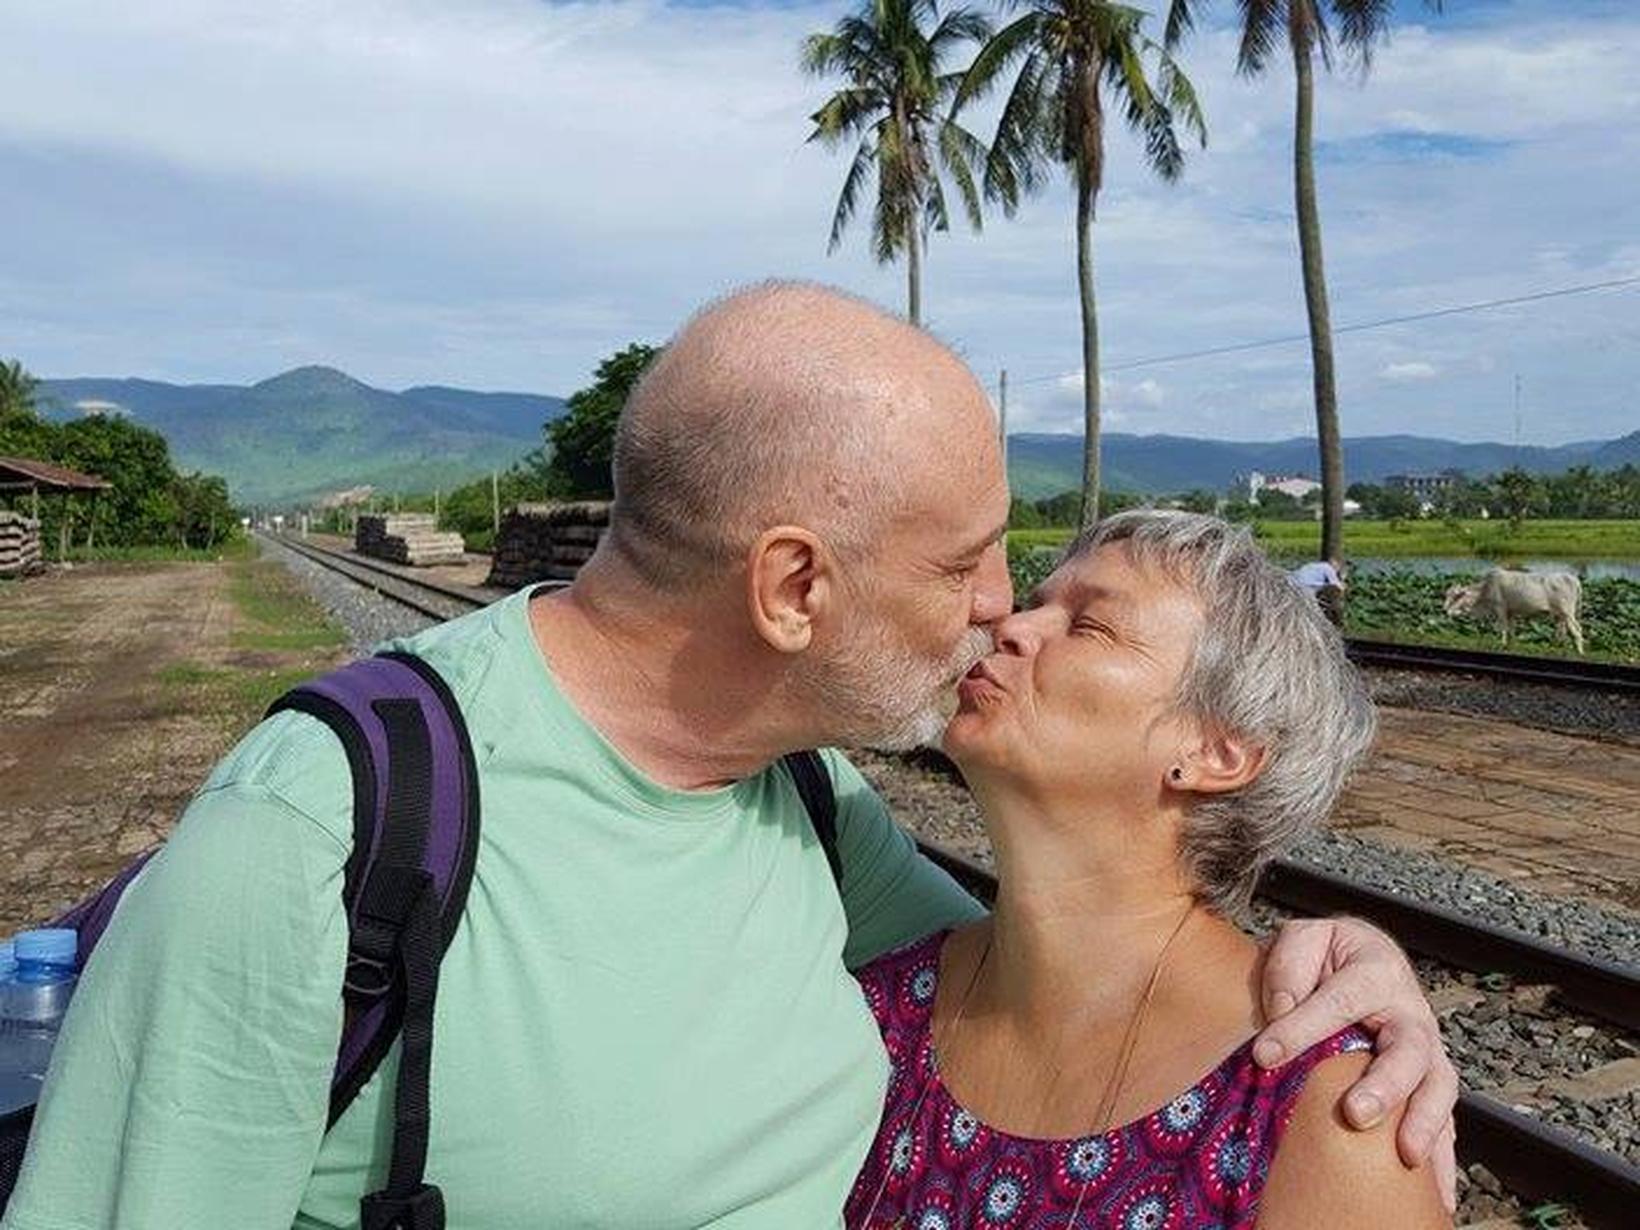 Bernadette & Jean-paul from Phnom Penh, Cambodia